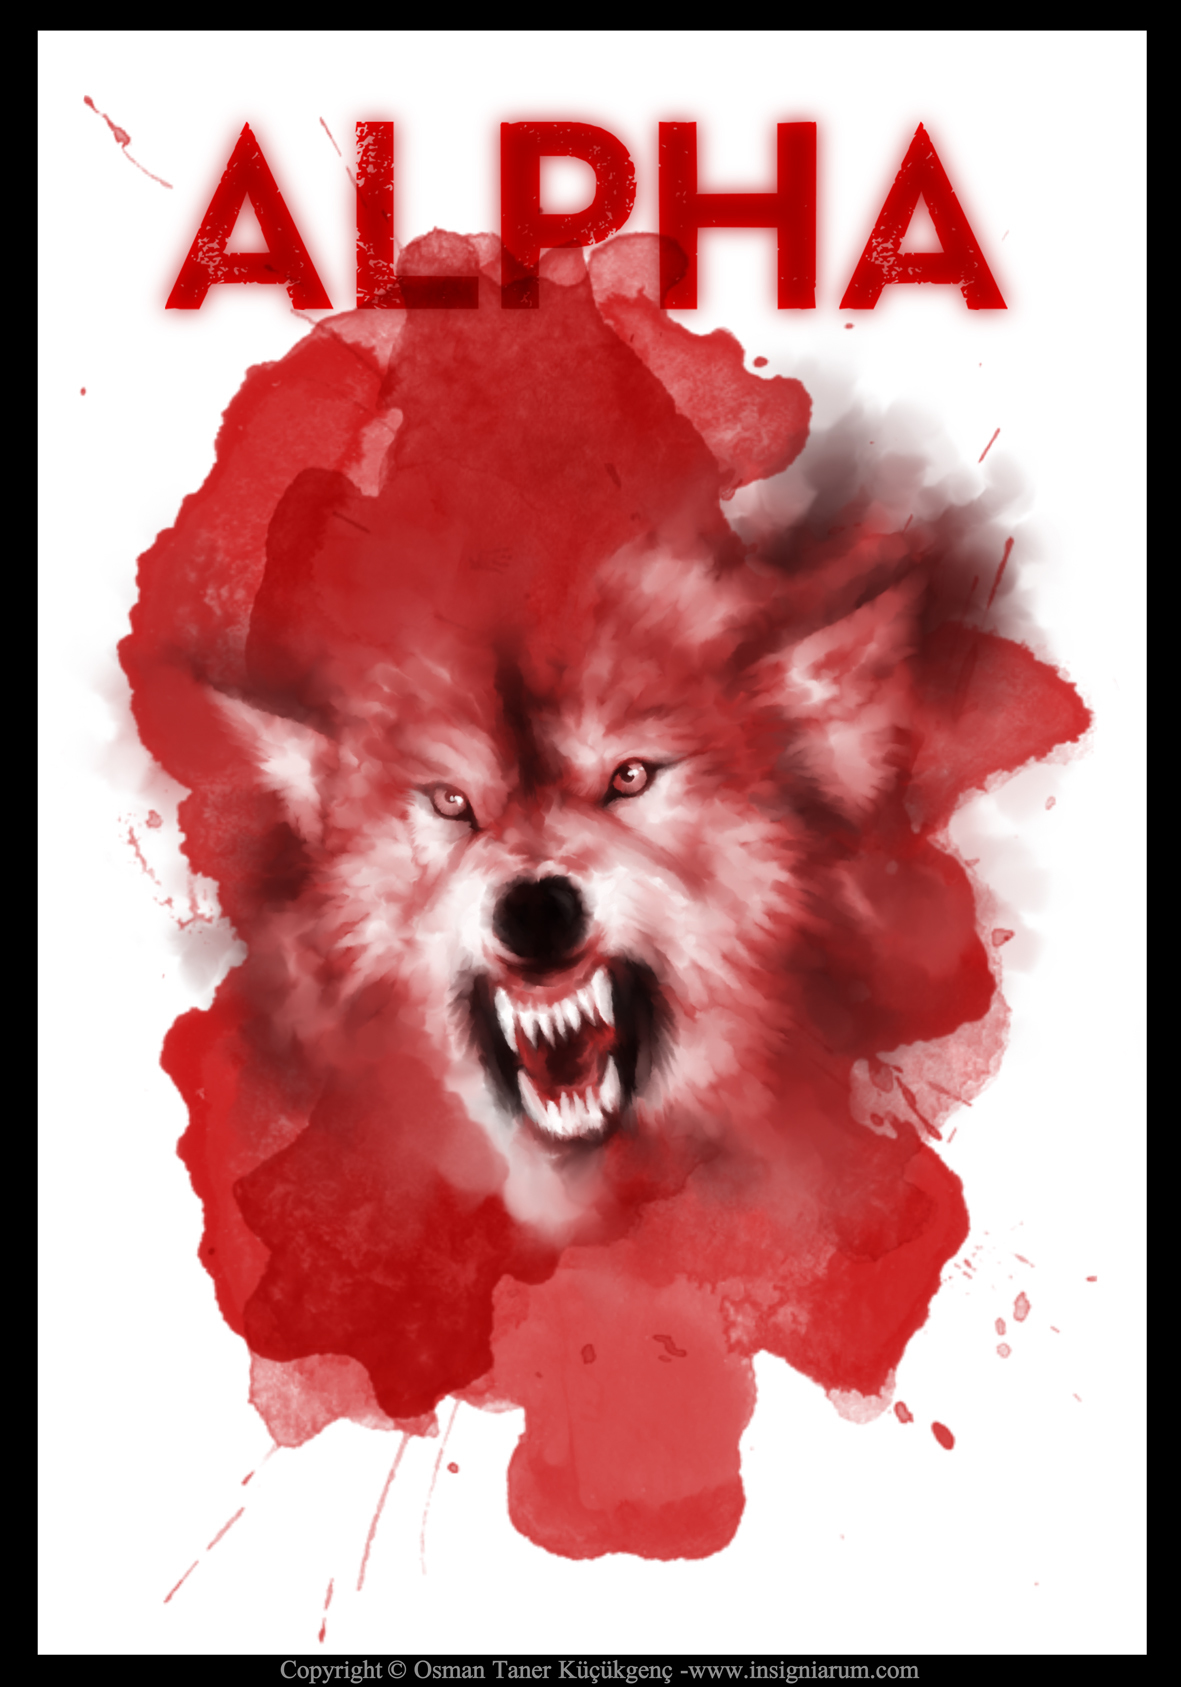 Wolf Alpha - Original